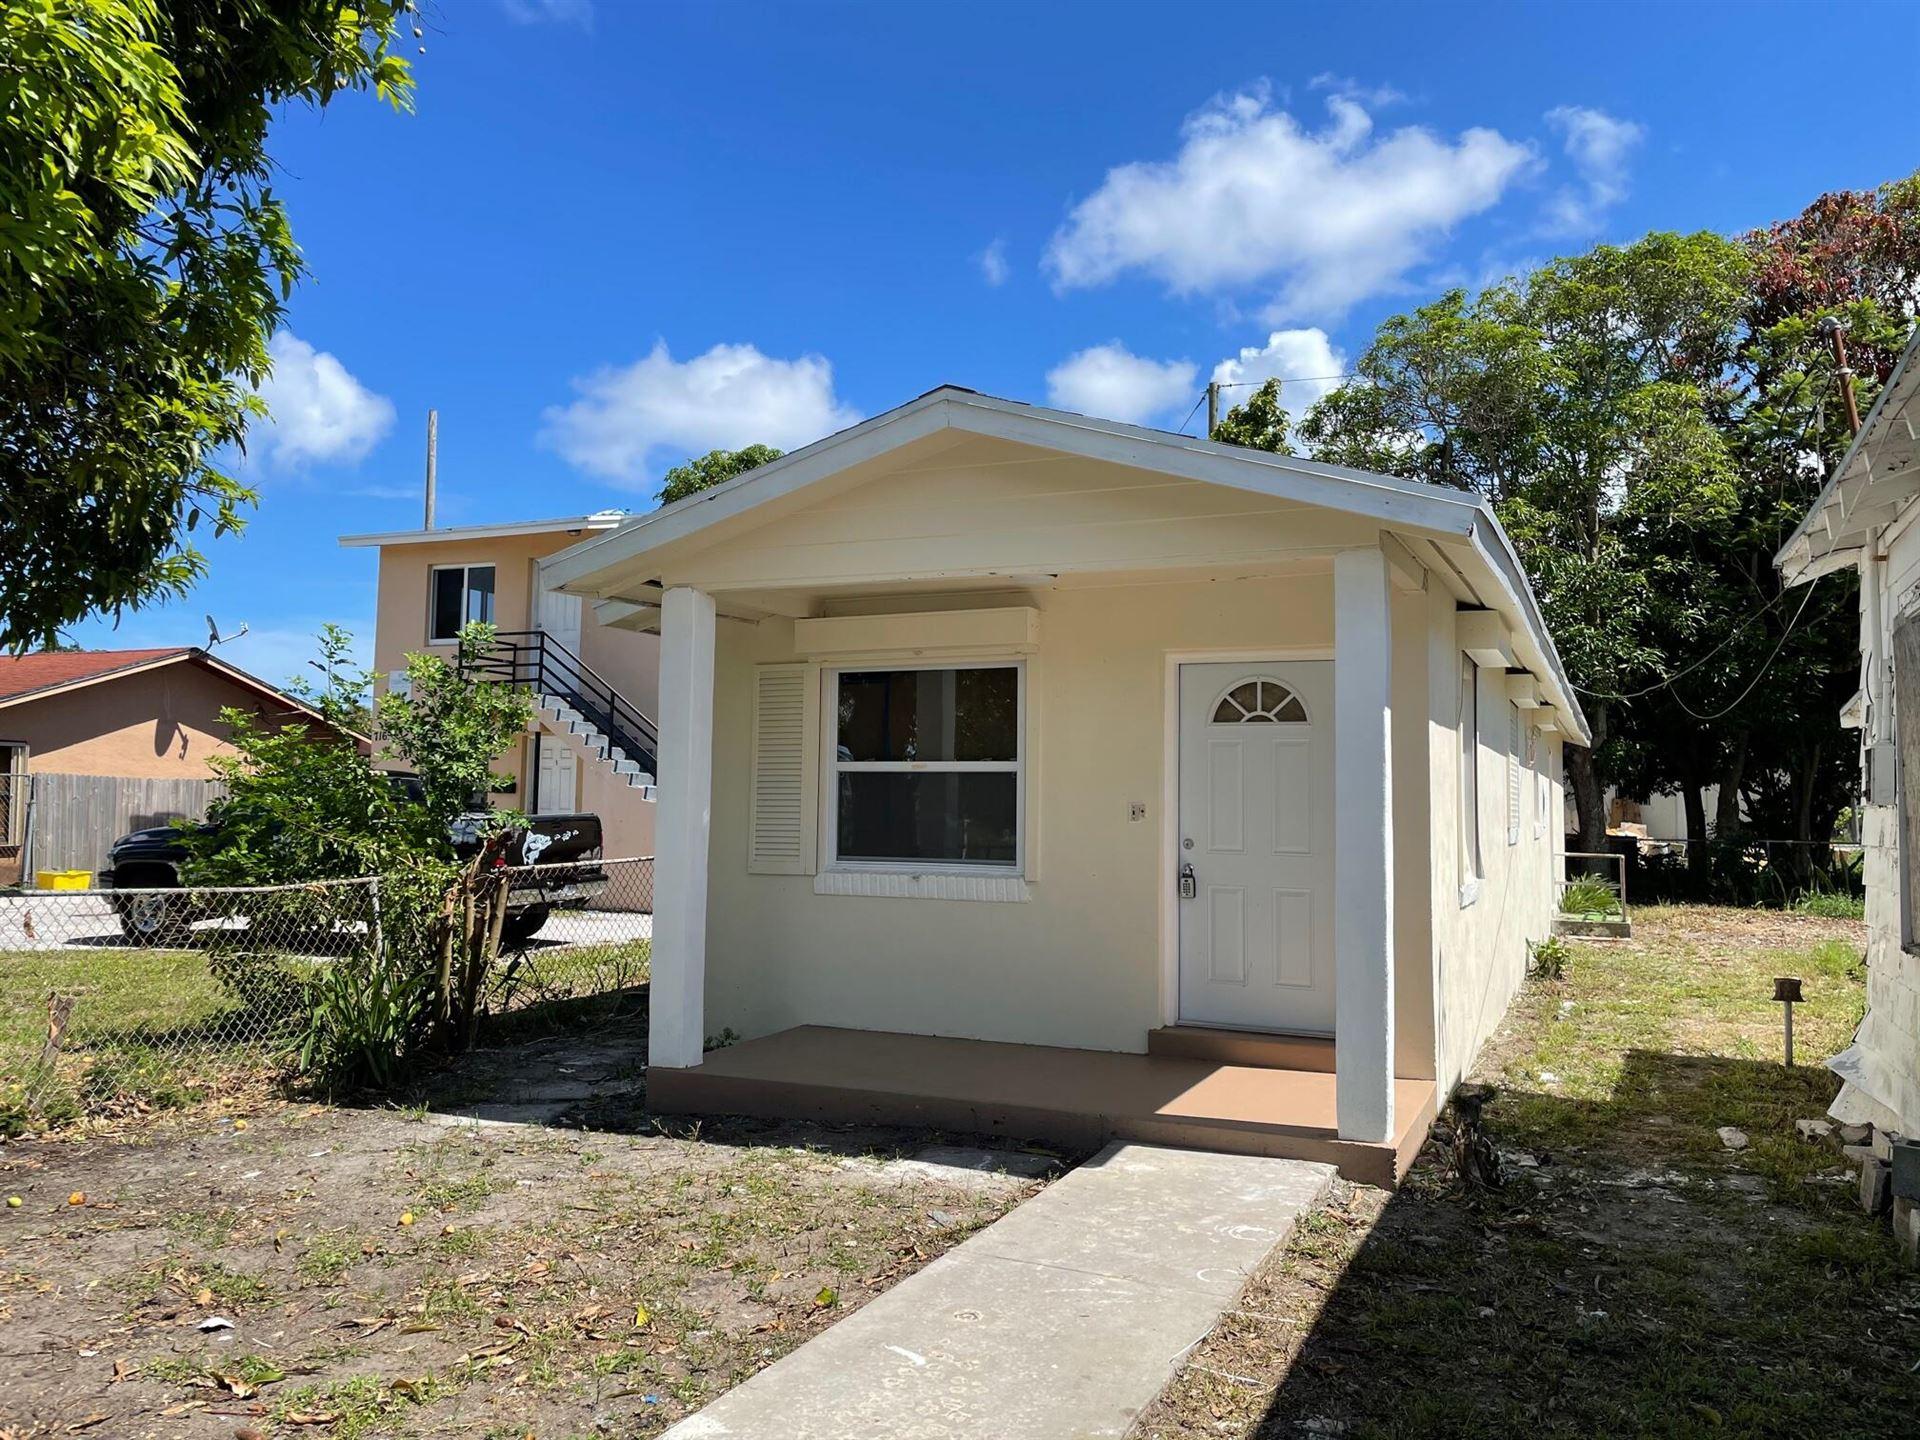 714 22nd Street, West Palm Beach, FL 33407 - MLS#: RX-10731645